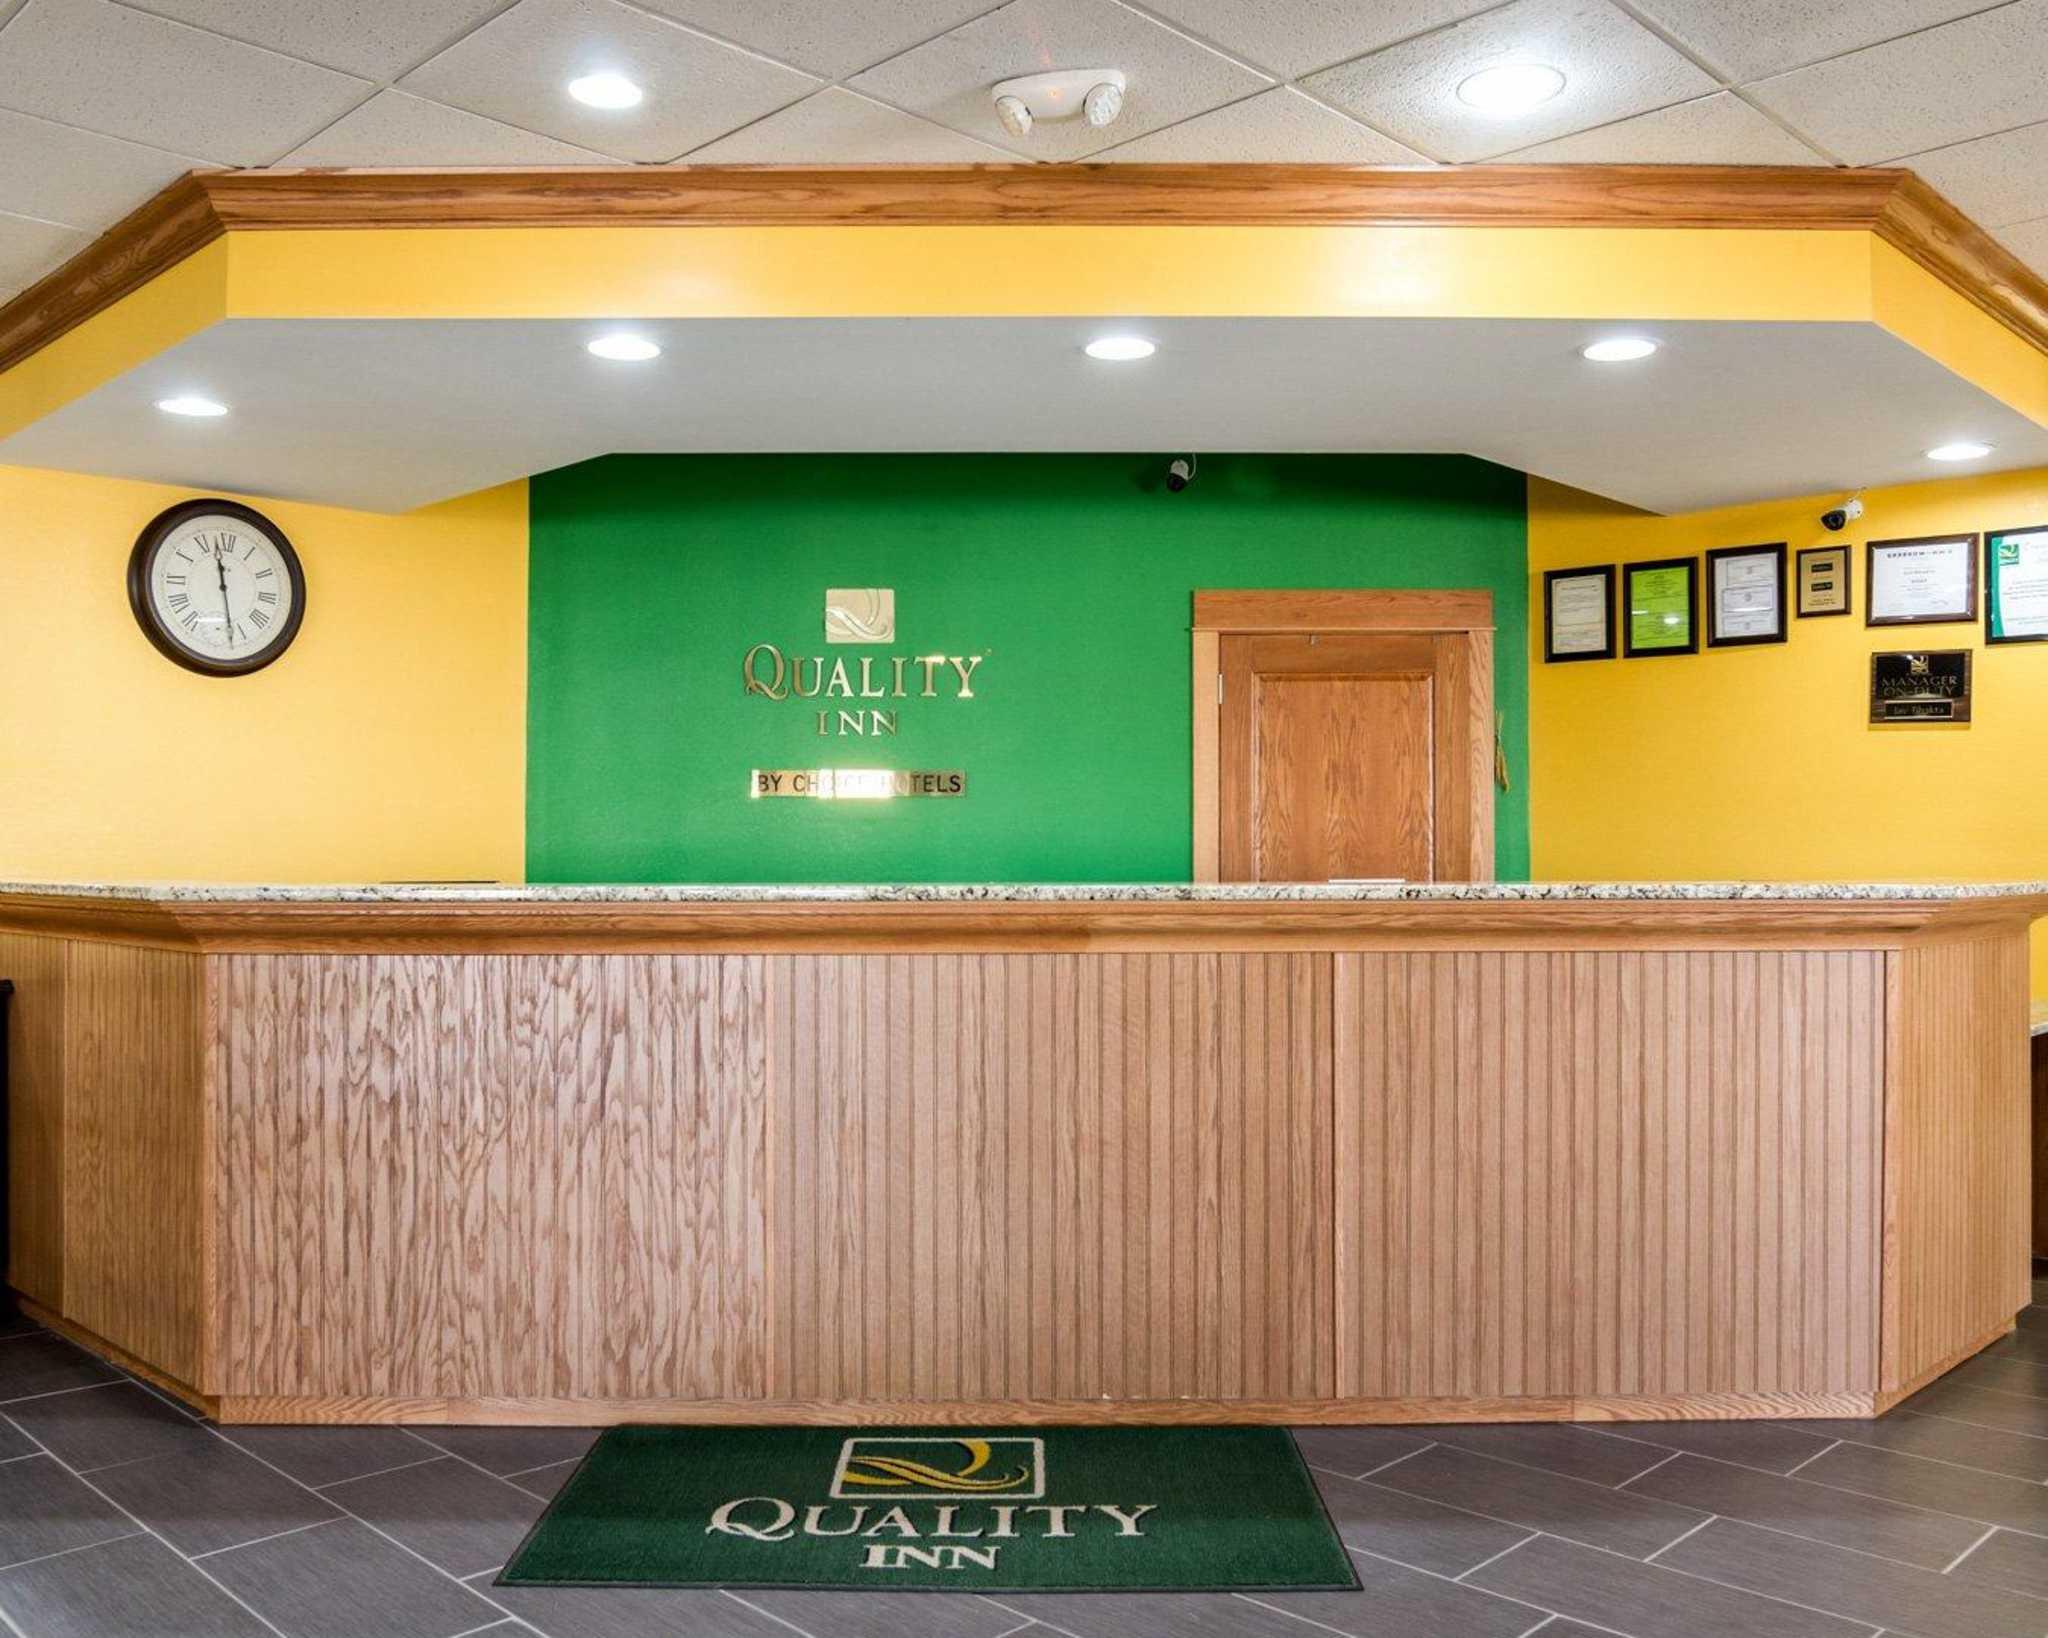 Quality Inn image 17